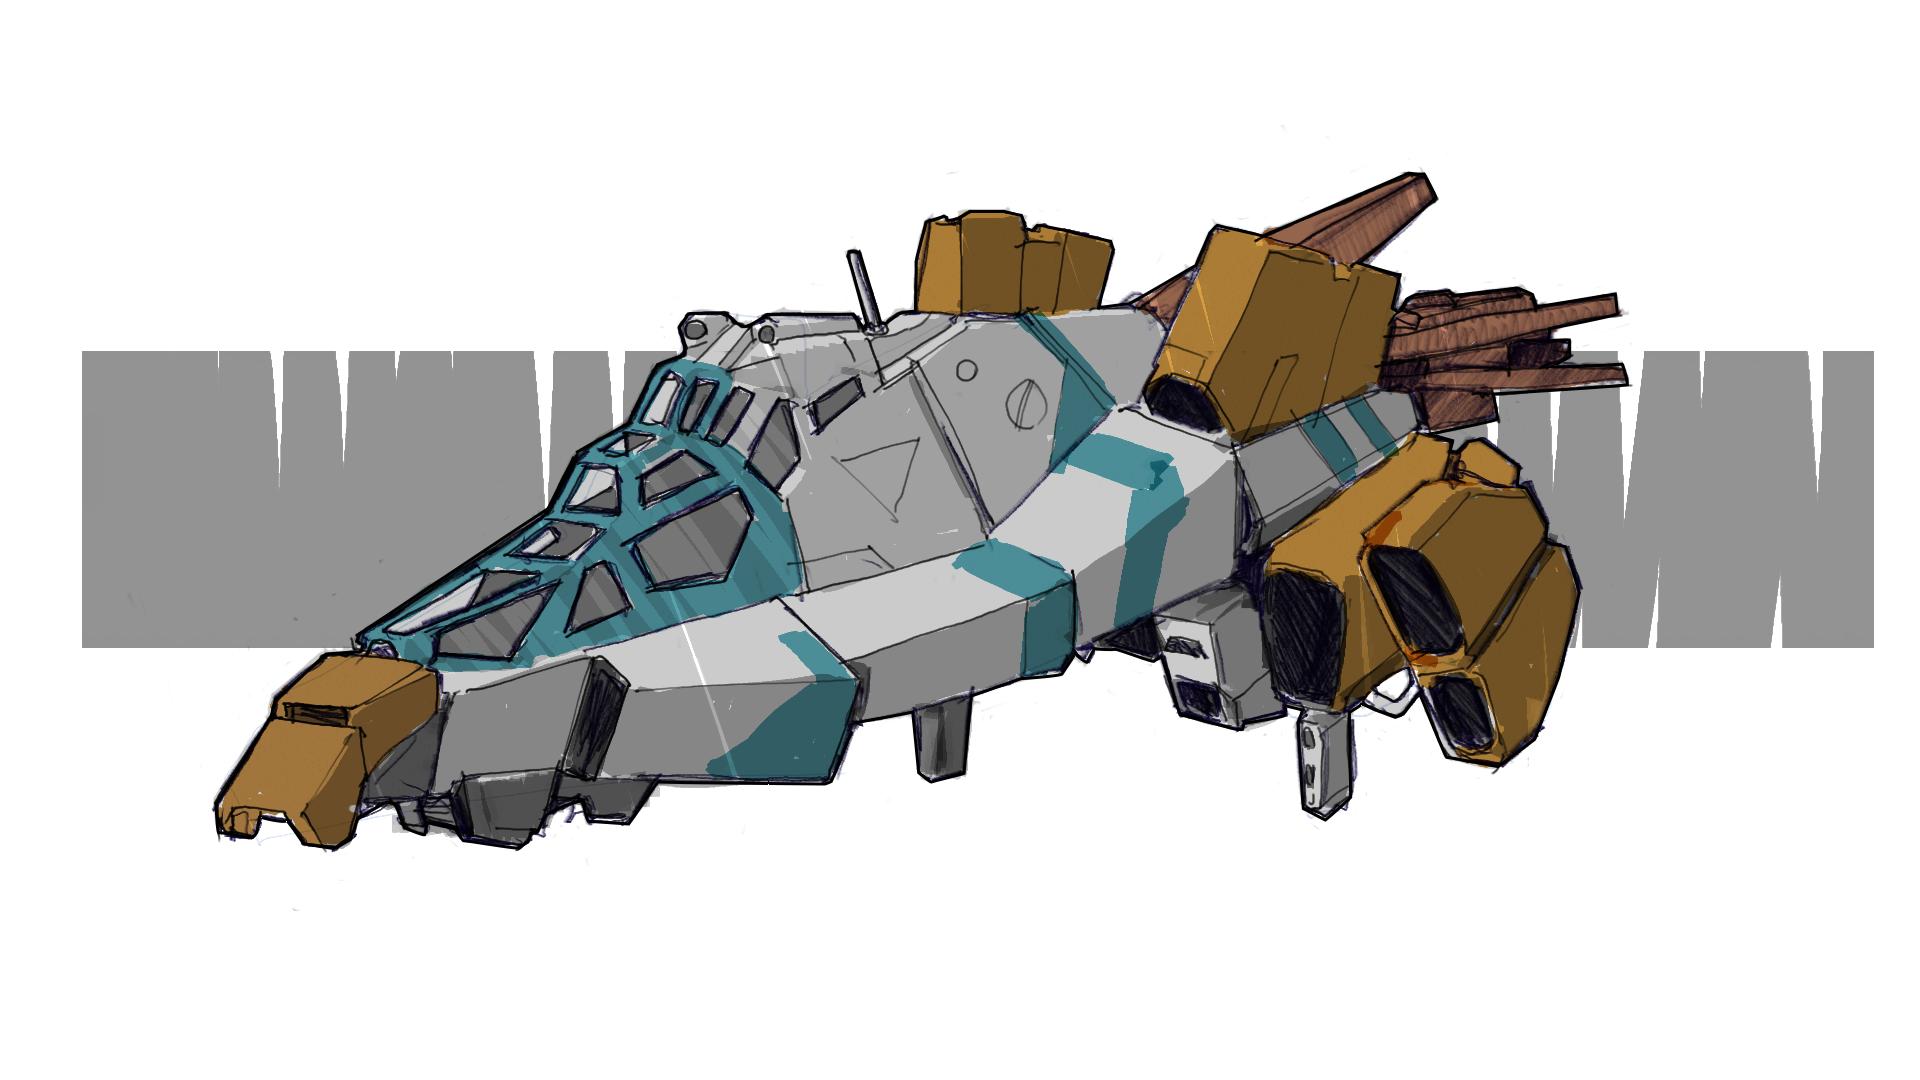 Flying_vehicle_jam_rendered